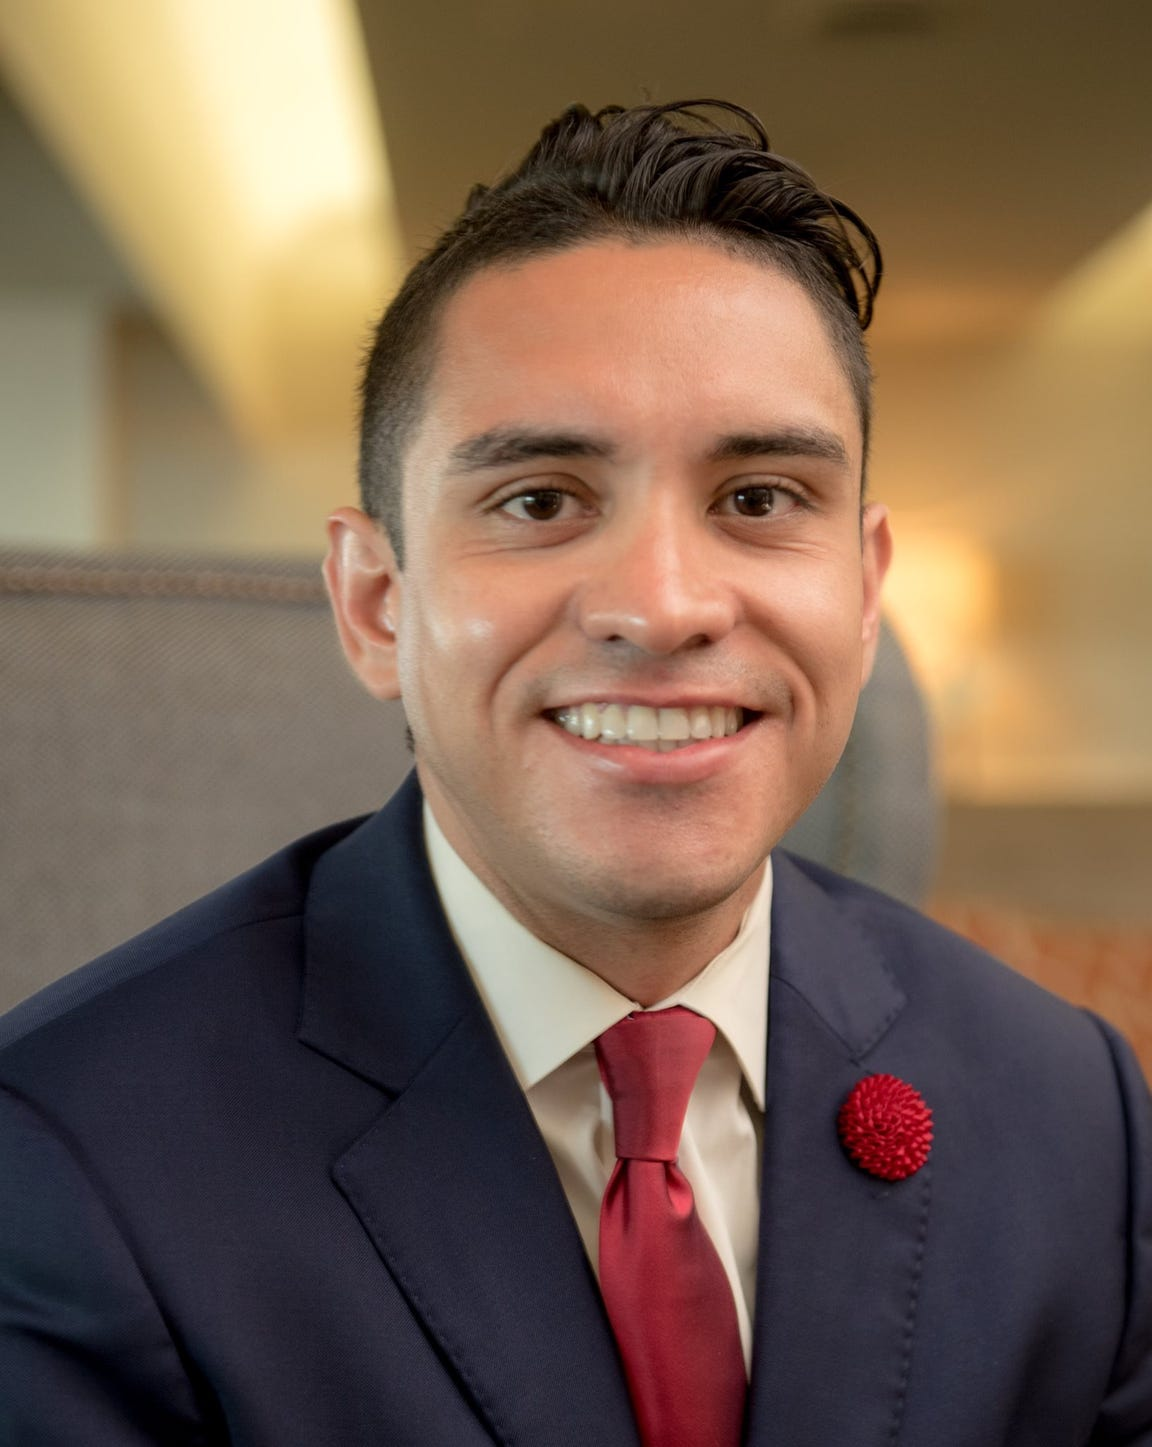 Corpus Christi City Council District 2 candidate RJ Torres